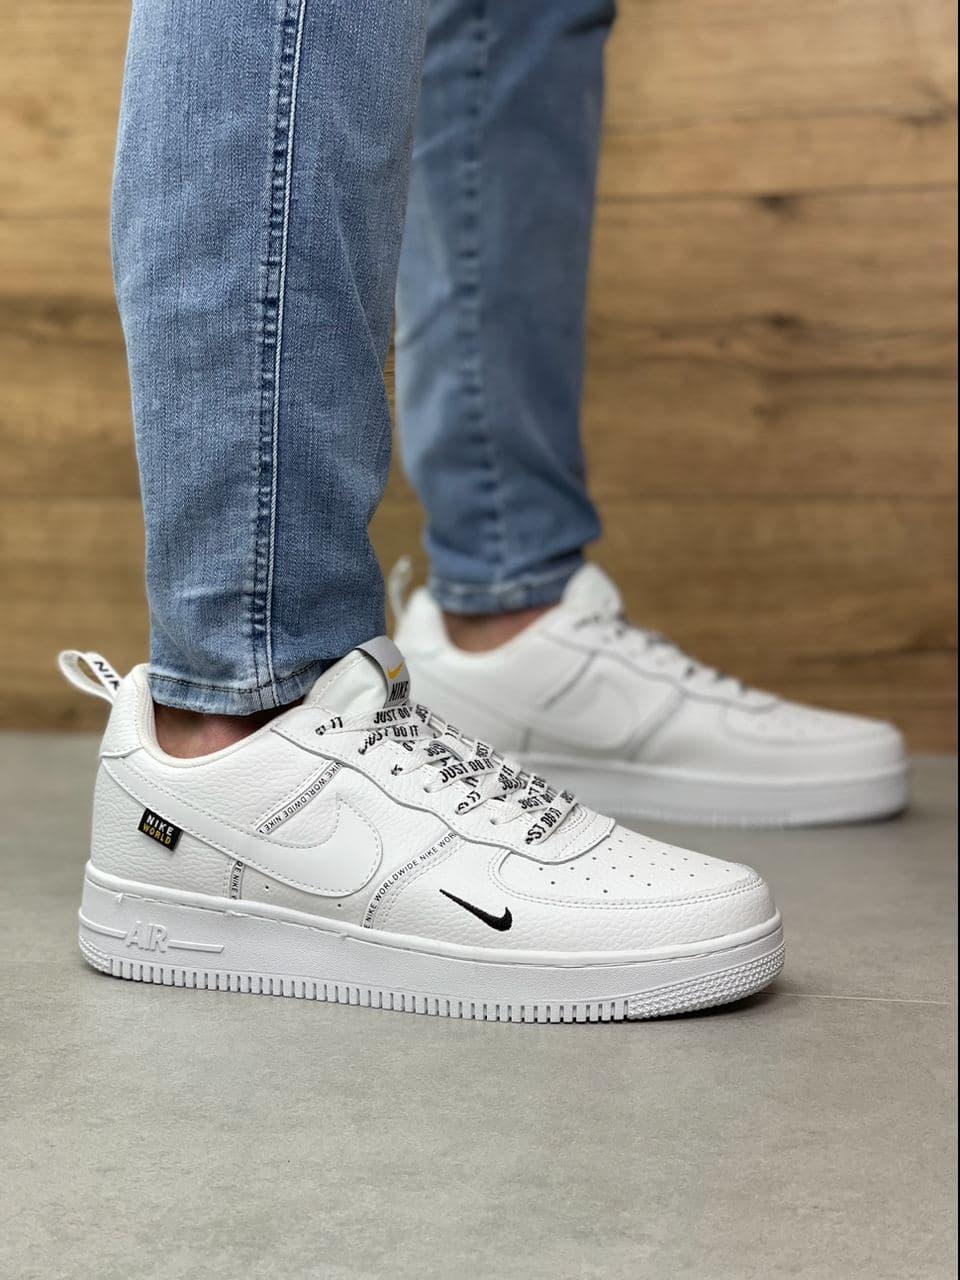 Мужские кроссовки Nike Air Force 1 Worldwide | All white